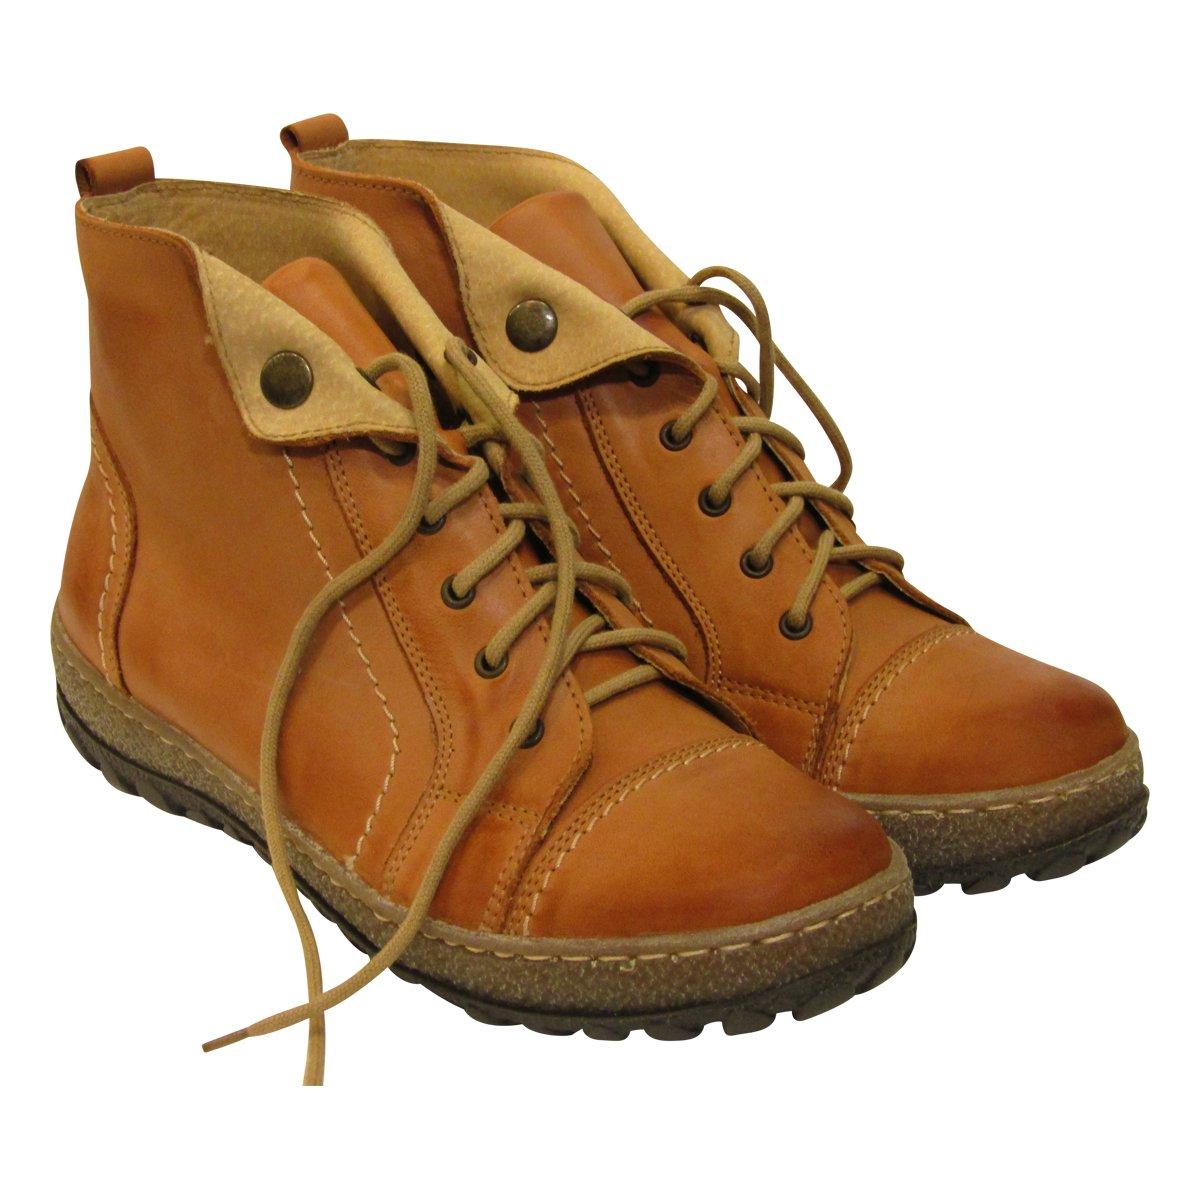 V Italia 1041 Women's Kiki Casual Leather Trainers B01N91JNOG 36 EU|Camel Distressed